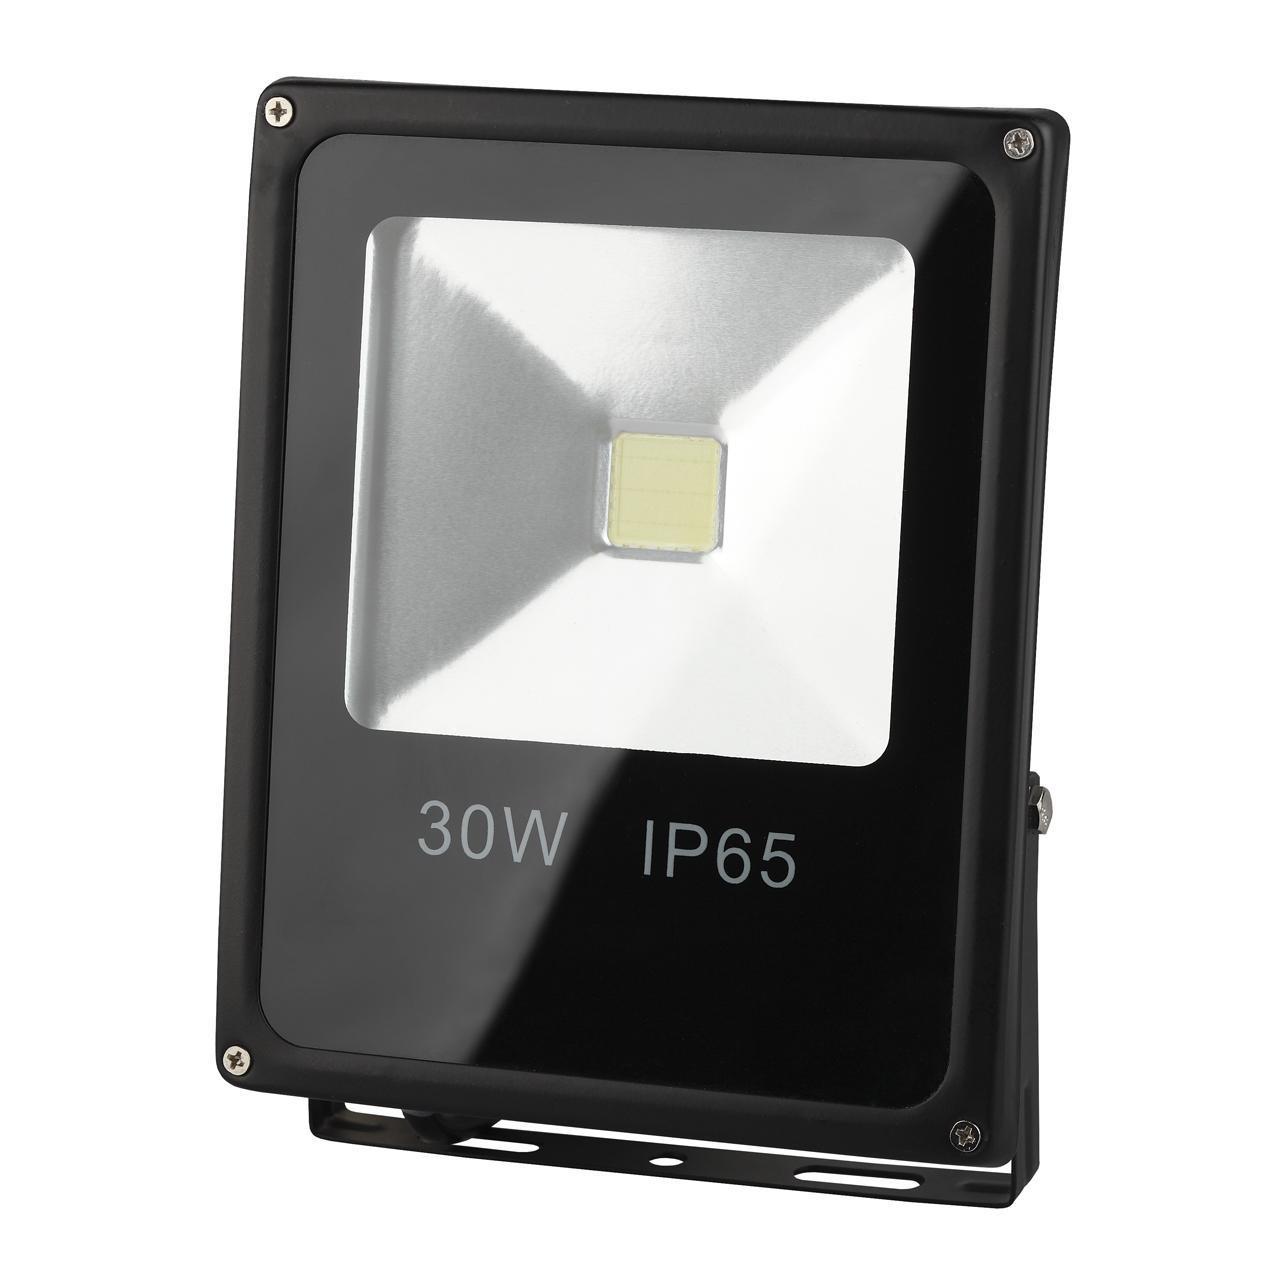 Прожектор Эра LPR-30-6500K-M, 30 Вт